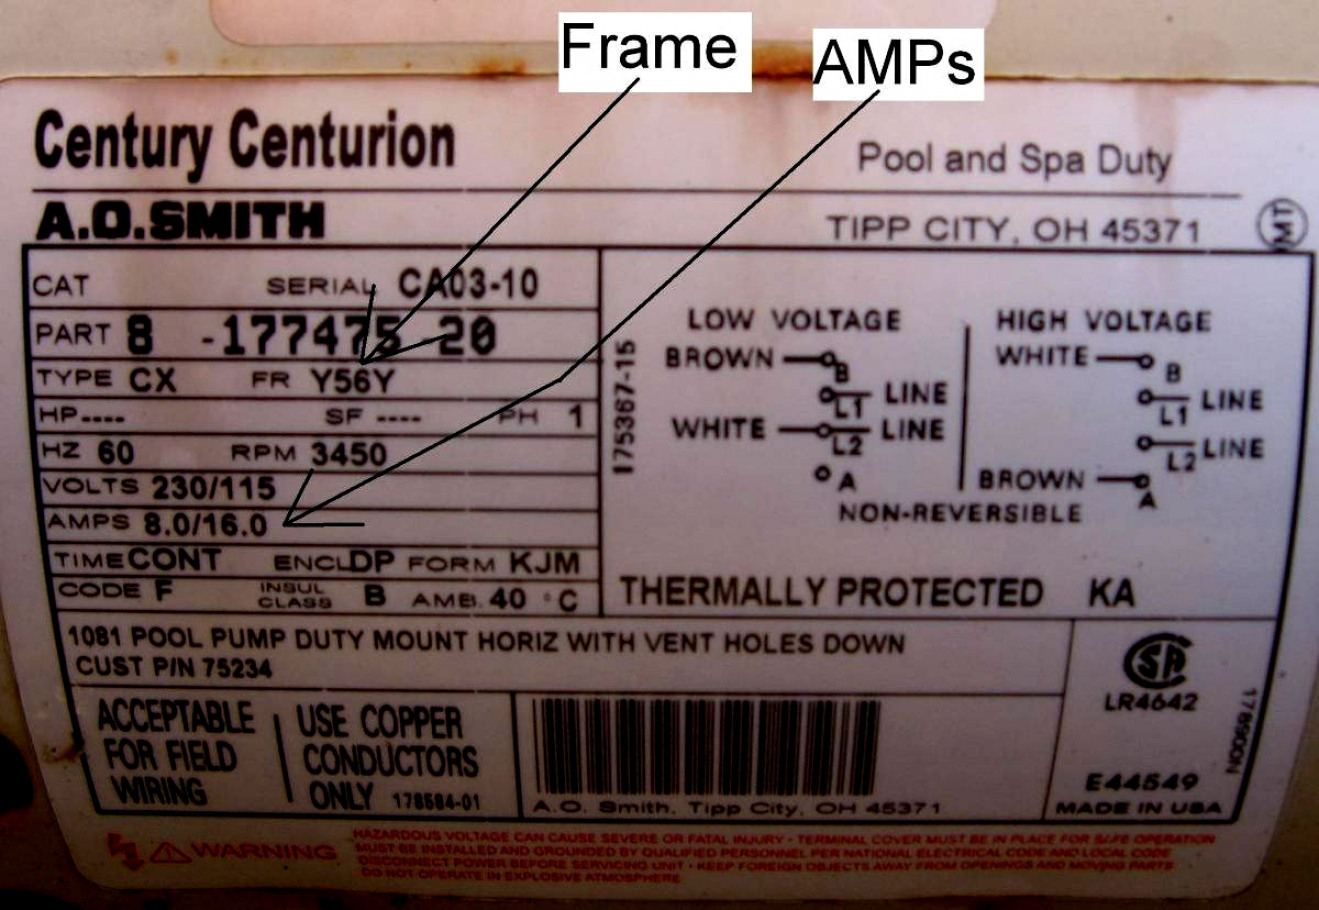 Wiring Diagram 115230 Motor Ao Smith - All Wiring Diagram Data - Century Ac Motor Wiring Diagram 115 230 Volts